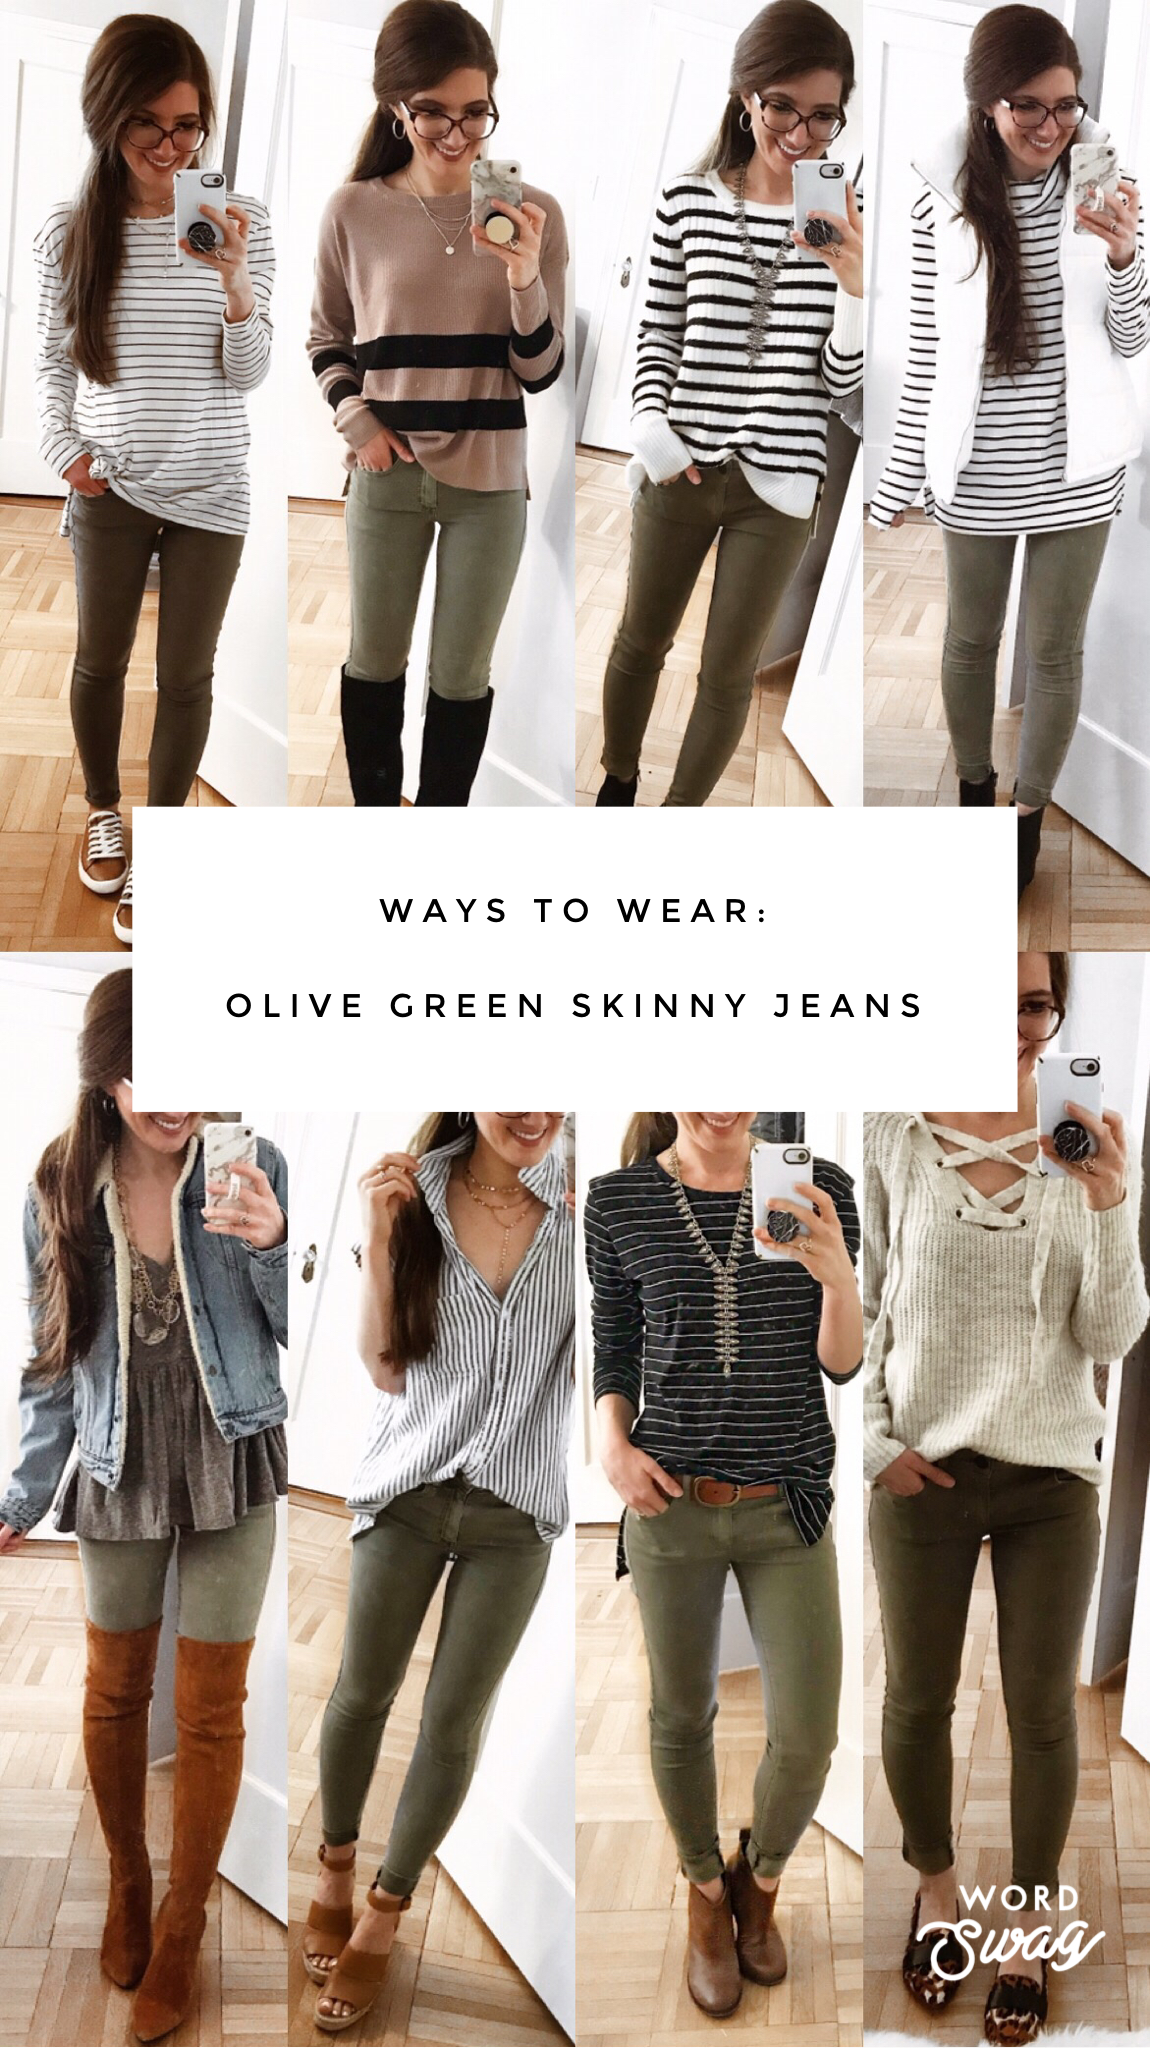 WAYS TO WEAR: Green Skinny Pants